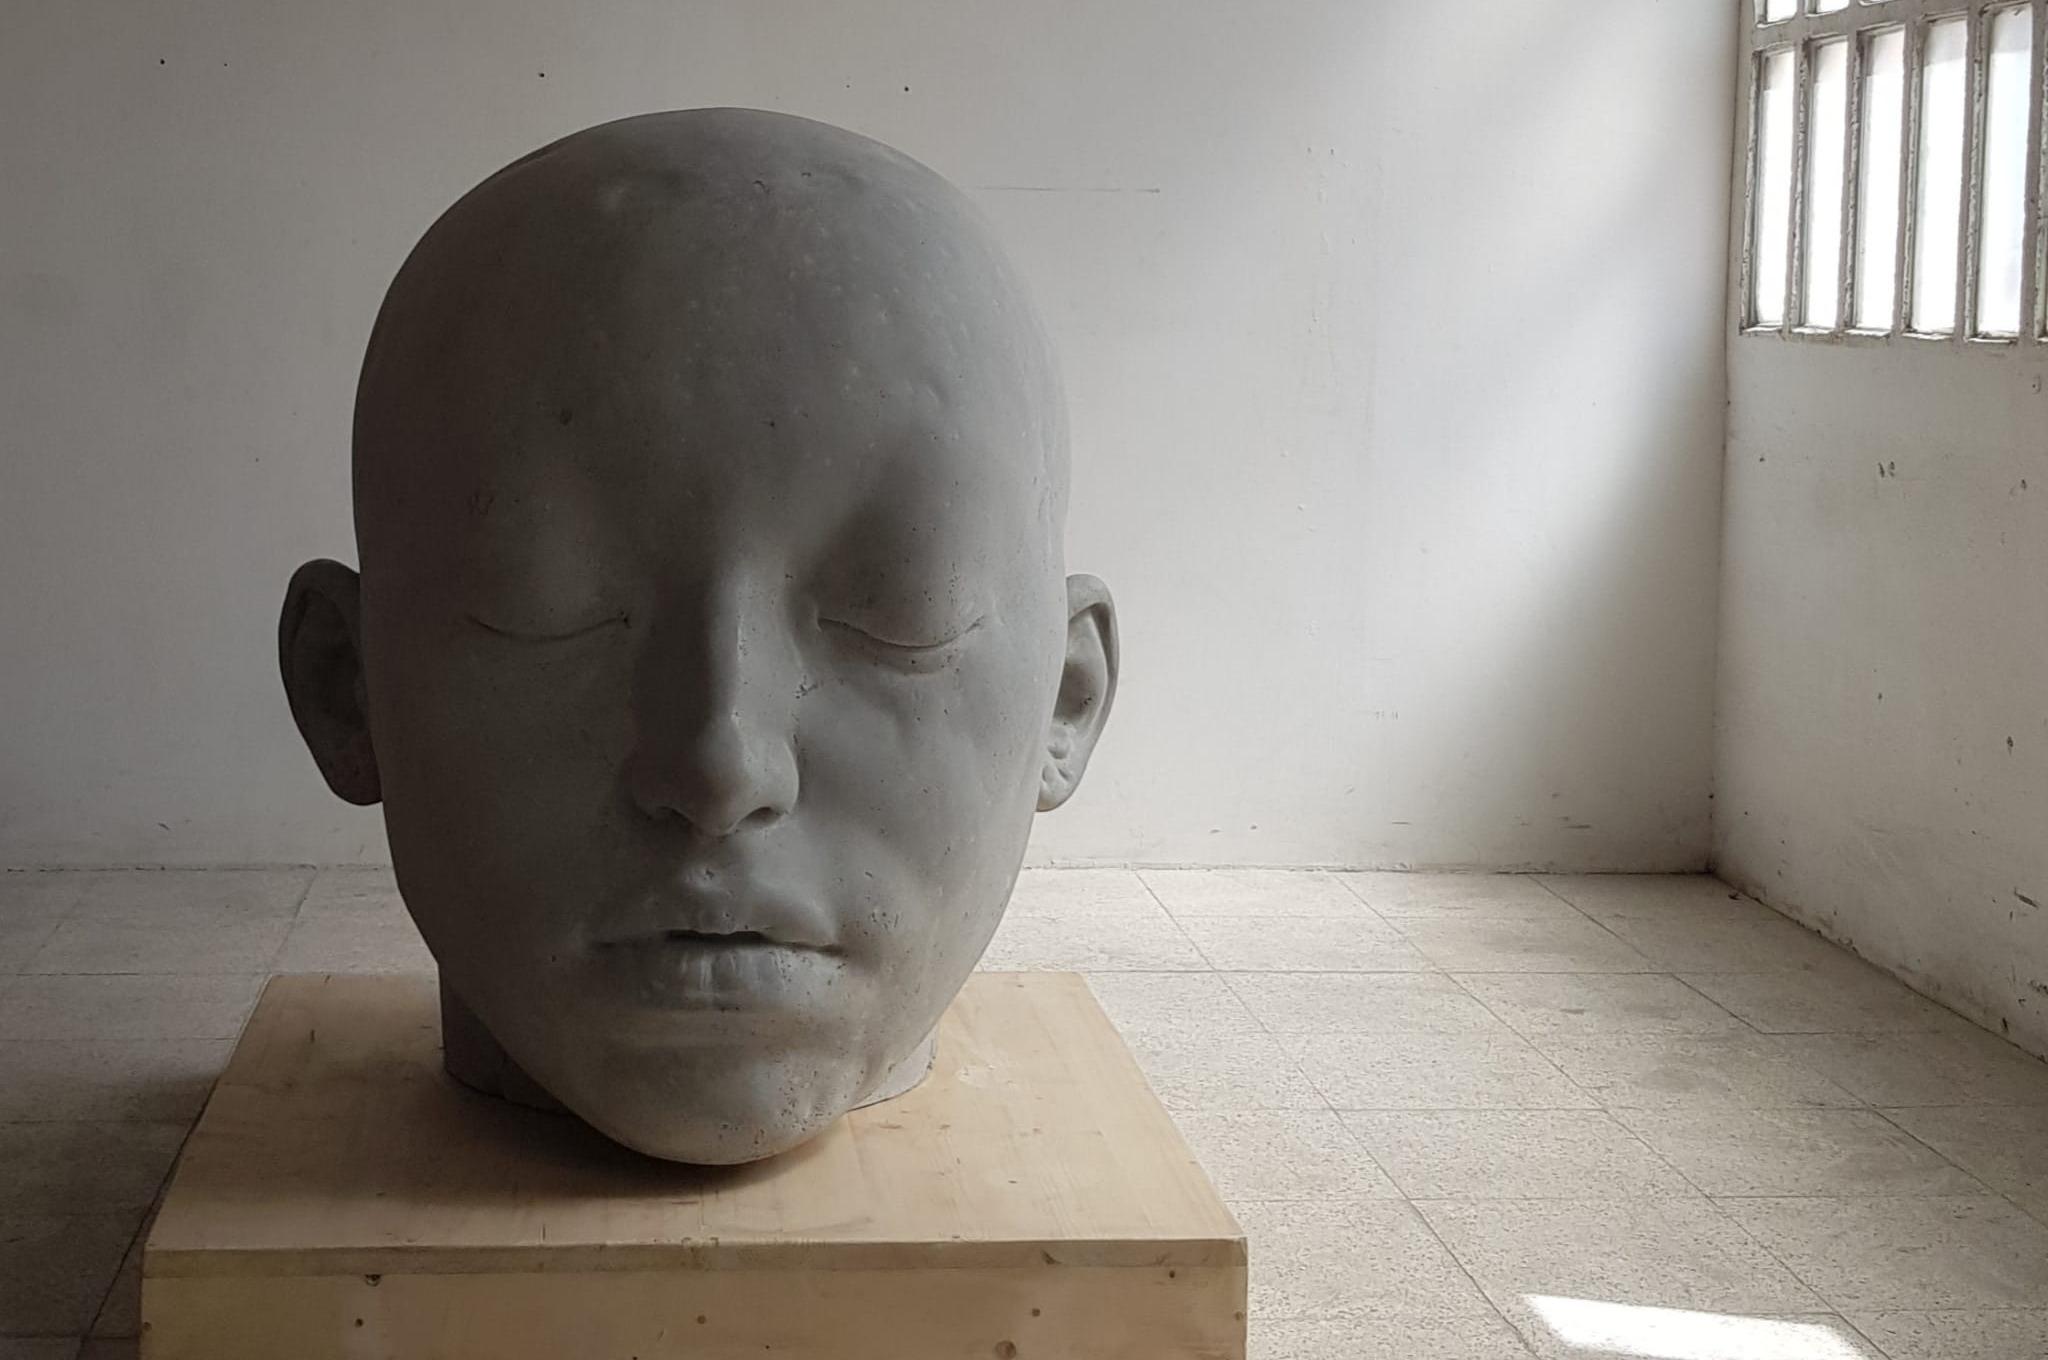 El-artista-Samuel-Salcedo-presenta-Under-construction-120x100x100